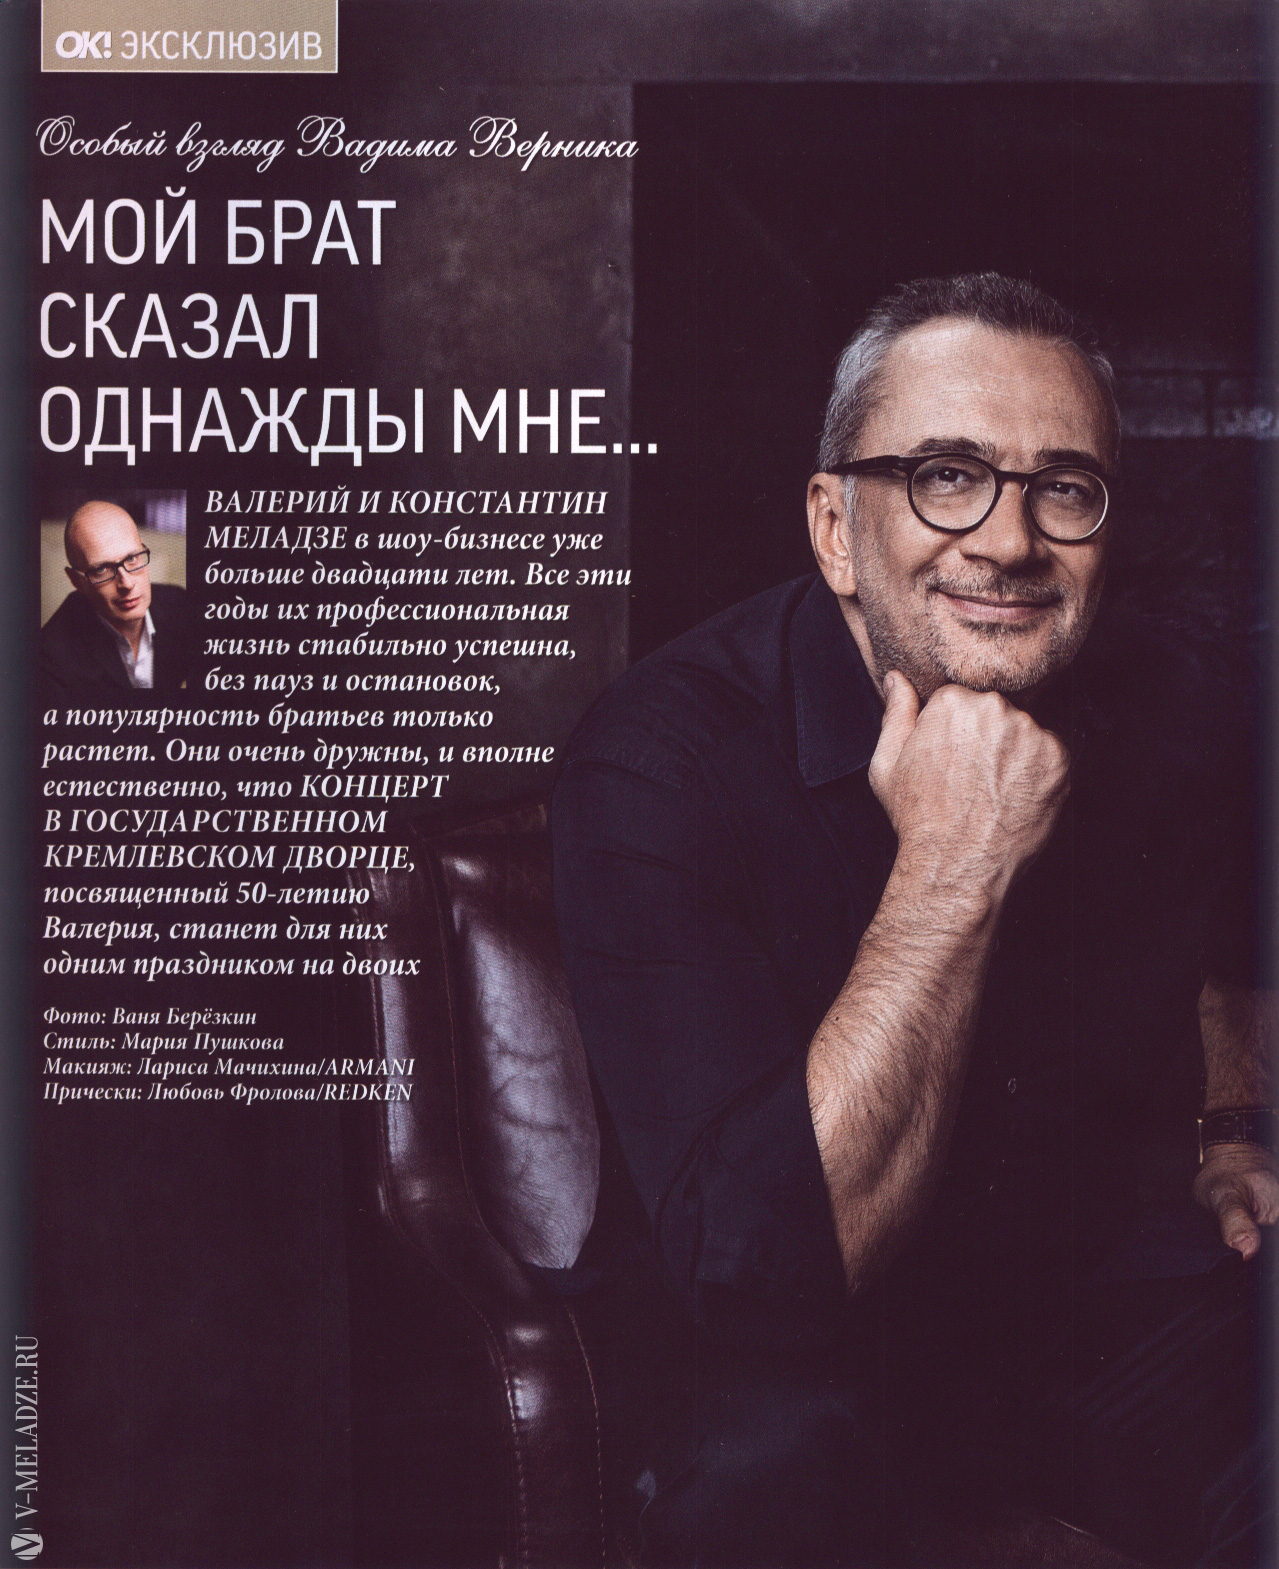 текст песни мой брат константин меладзе и валерий меладзе